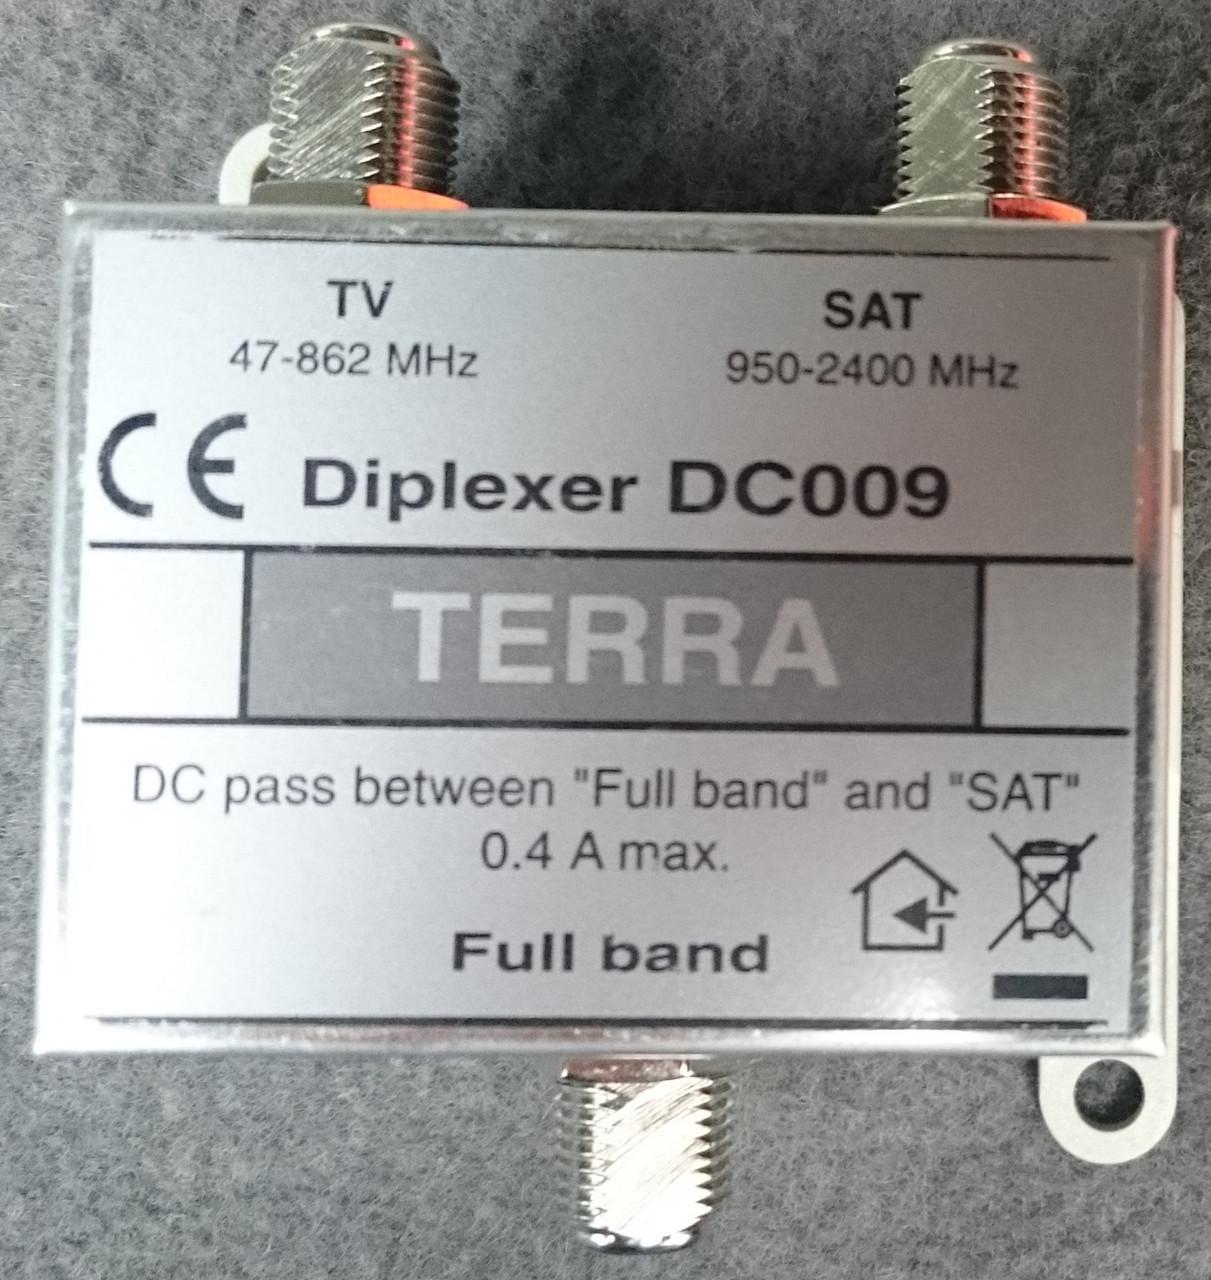 Комбайнер SAT/TV TERRA  Diplexer DC 009